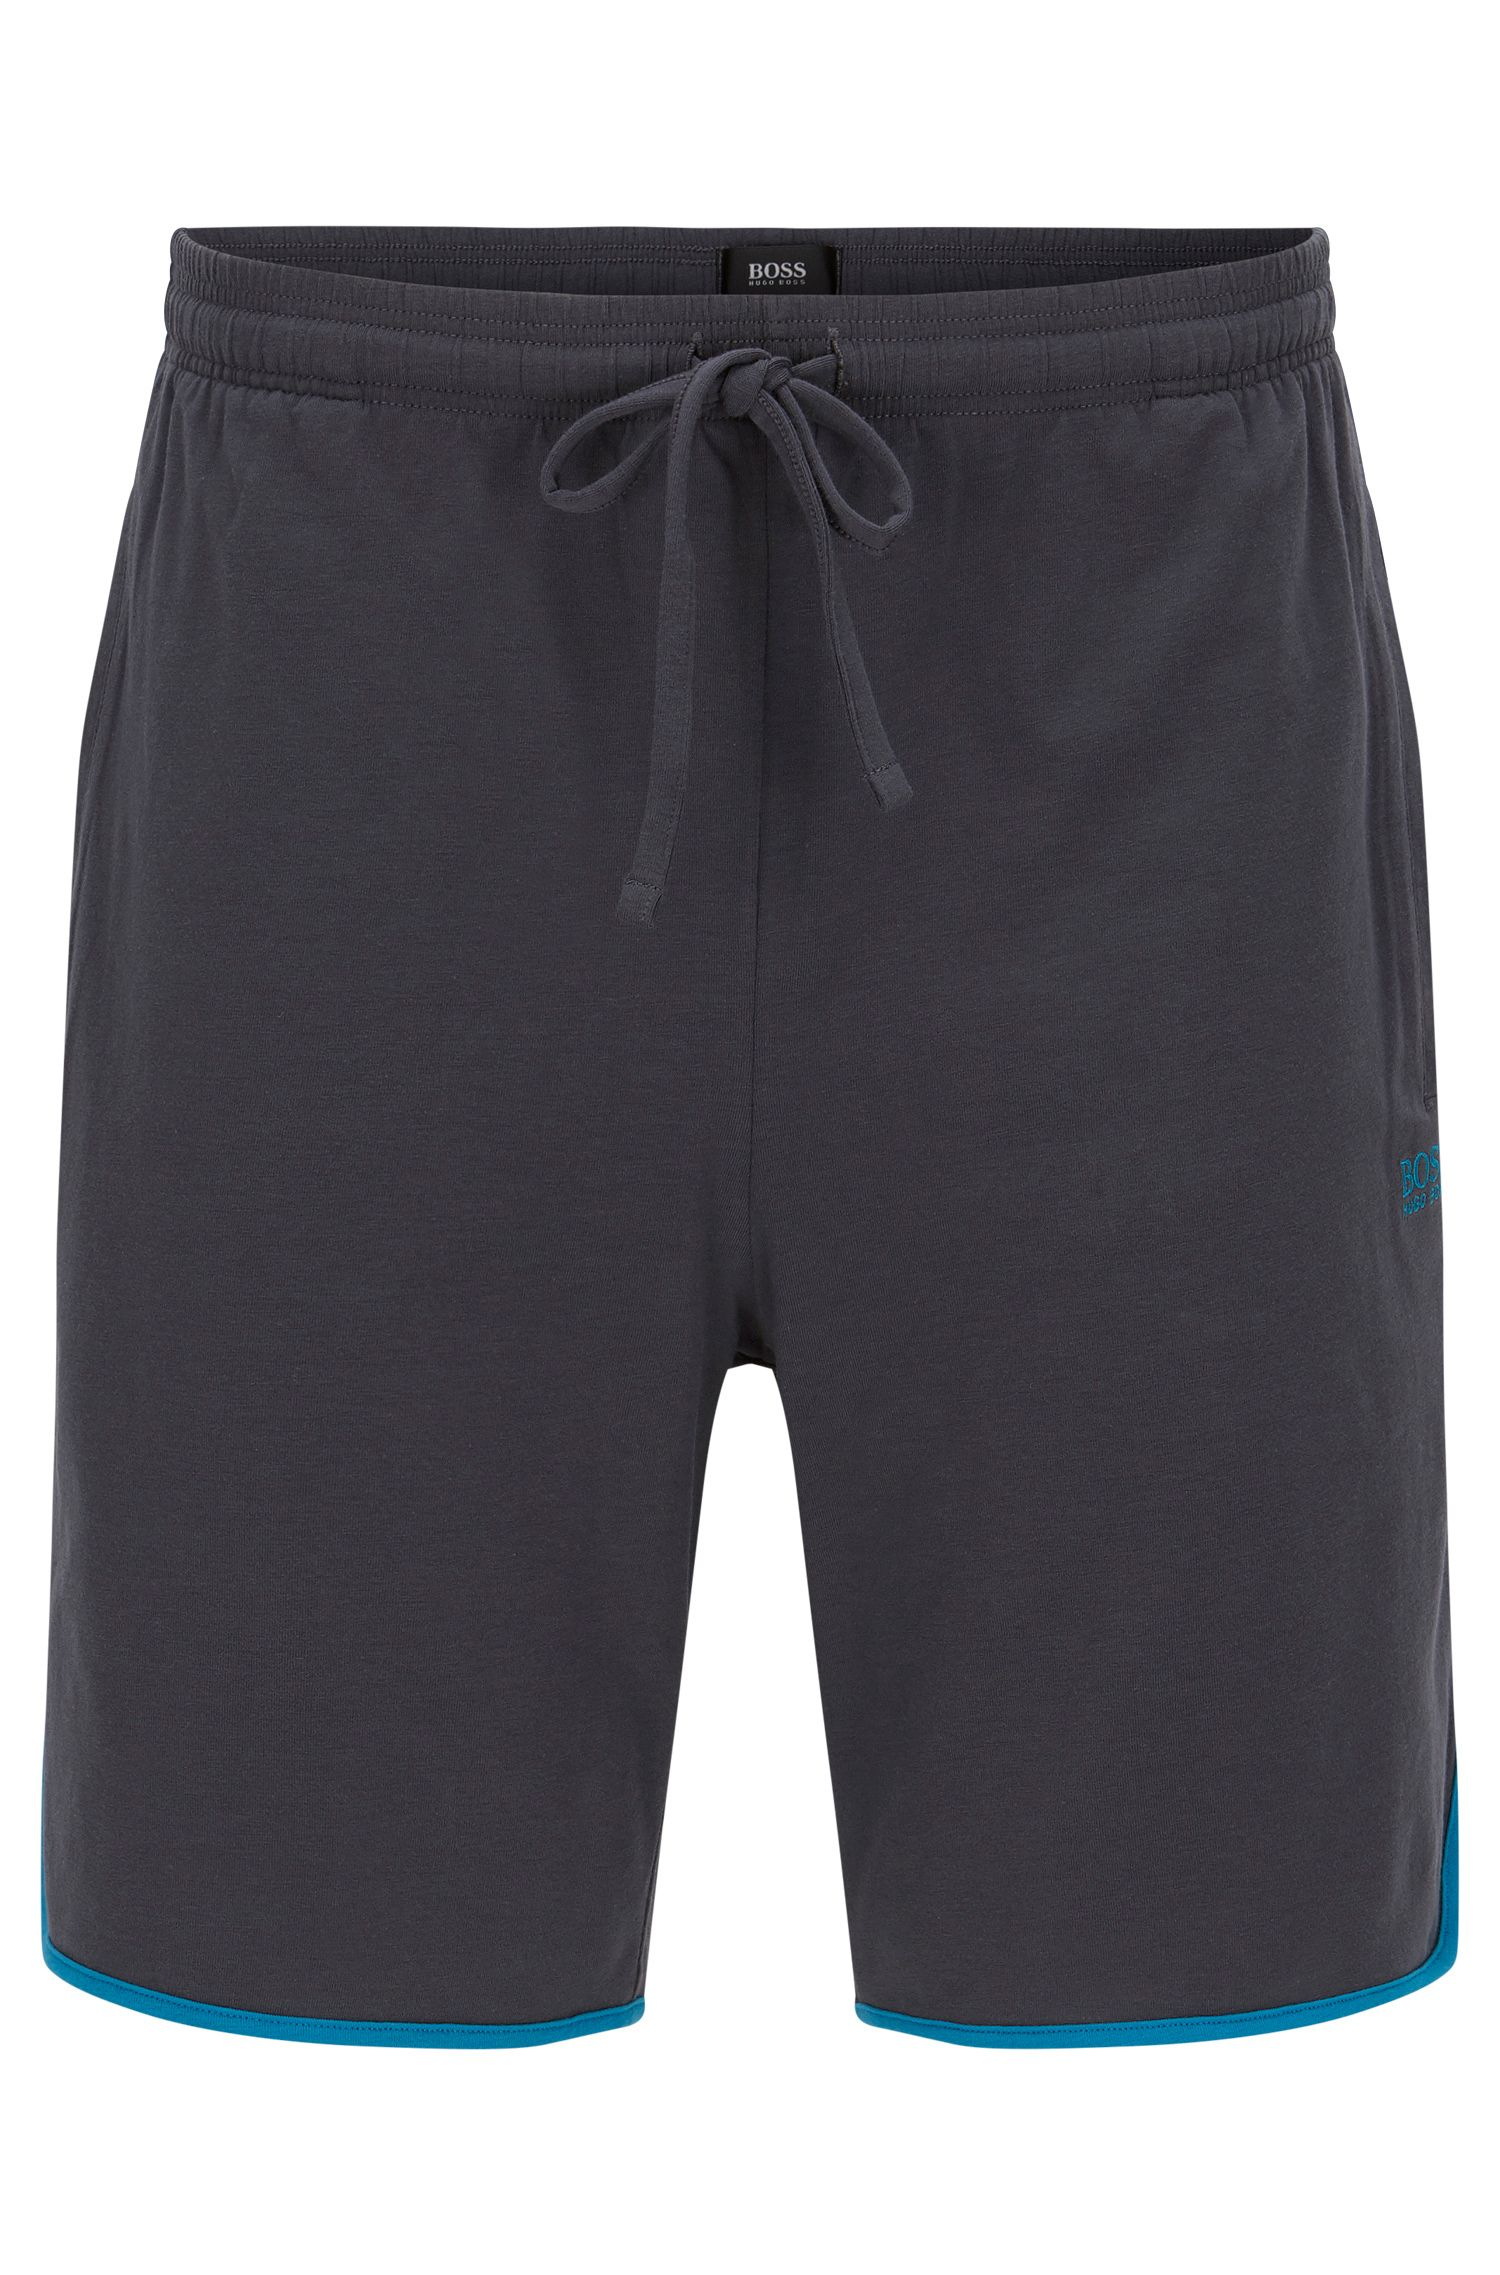 Bas de pyjama en jersey à passepoils contrastants